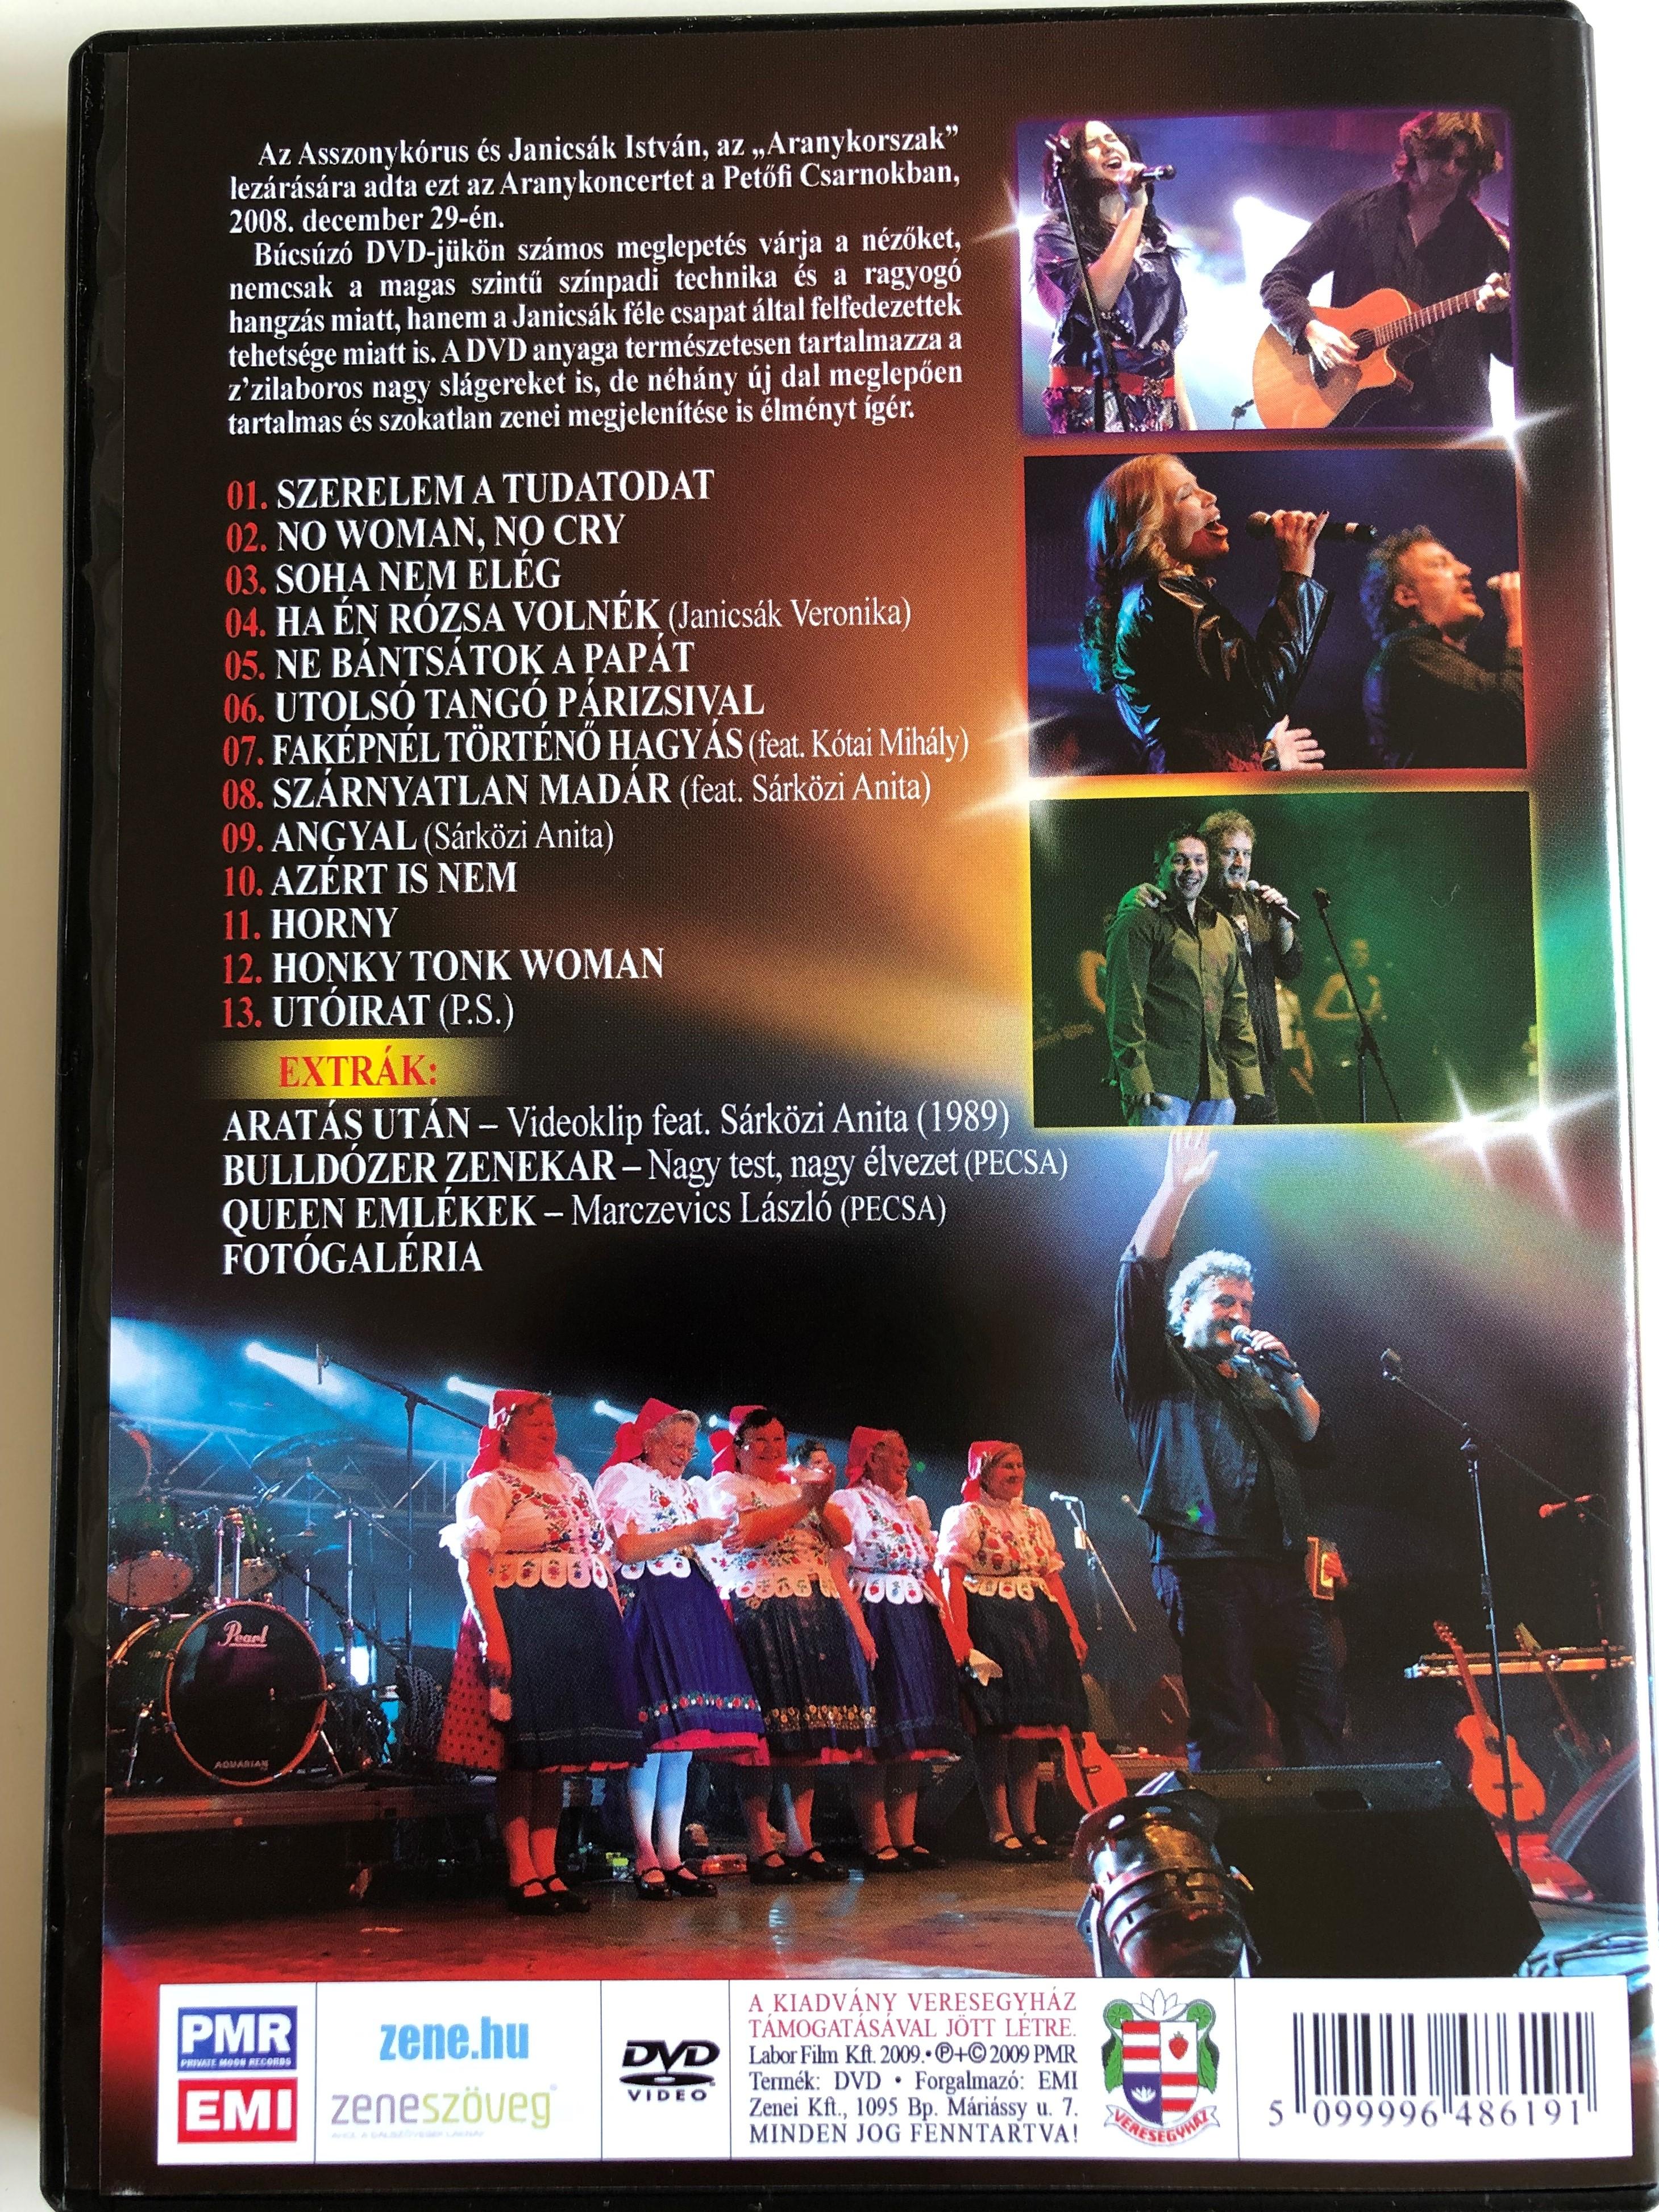 janics-k-istv-n-s-a-veresegyh-zi-asszonyk-rus-dvd-2009-b-cs-koncert-recorded-in-2008-in-pet-fi-hall-budapest-2-.jpg